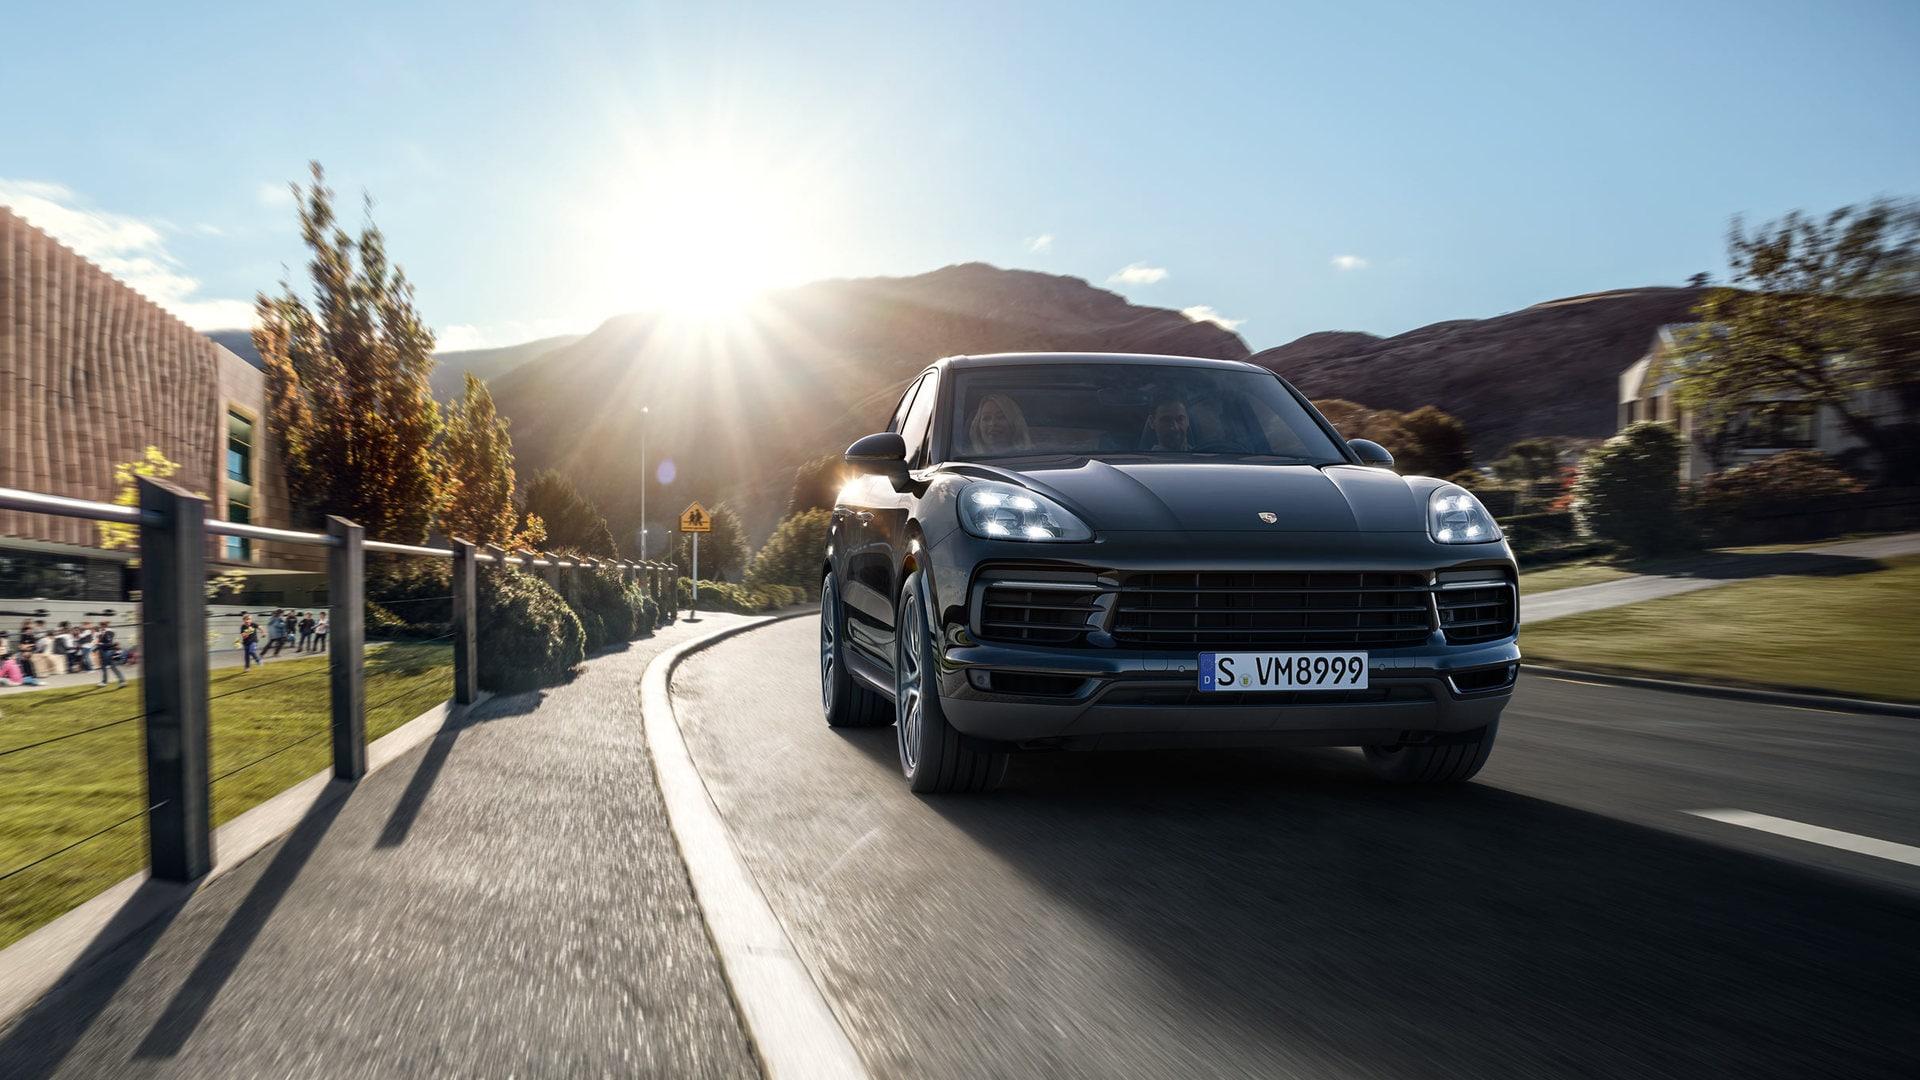 2019 Porsche Cayenne For Sale Luxury Car Dealer Near Me